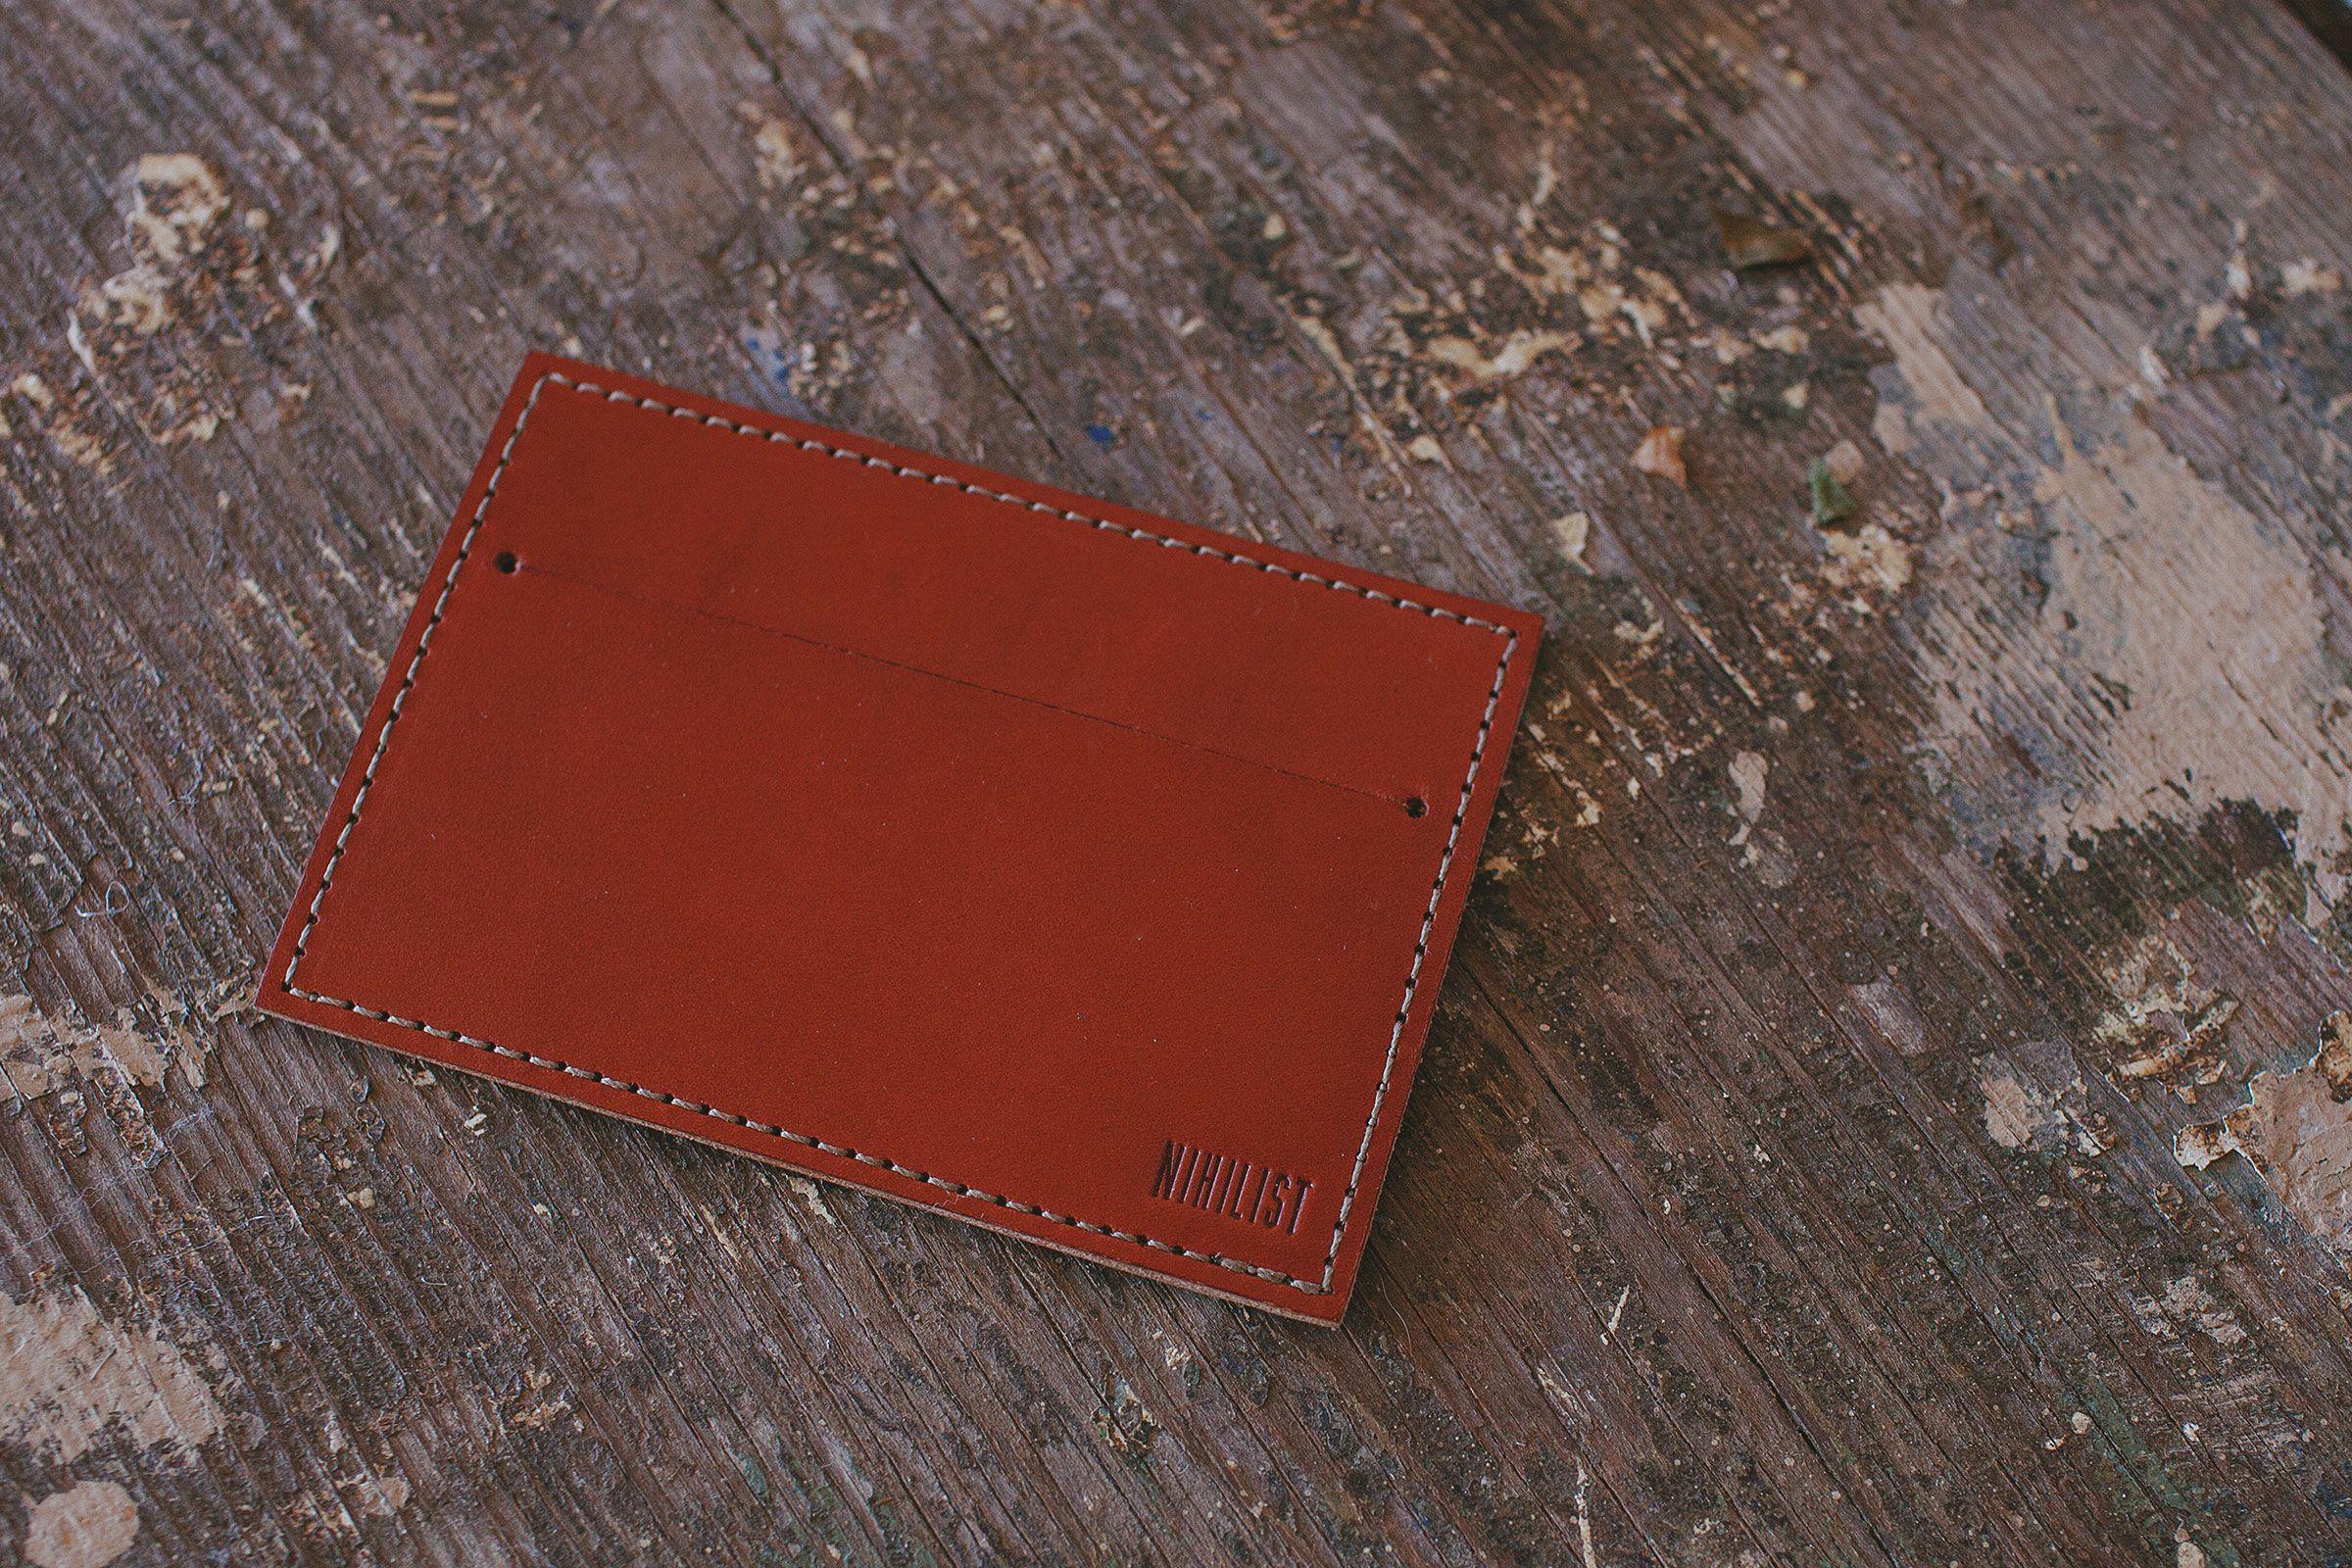 Chestnut leather card wallet